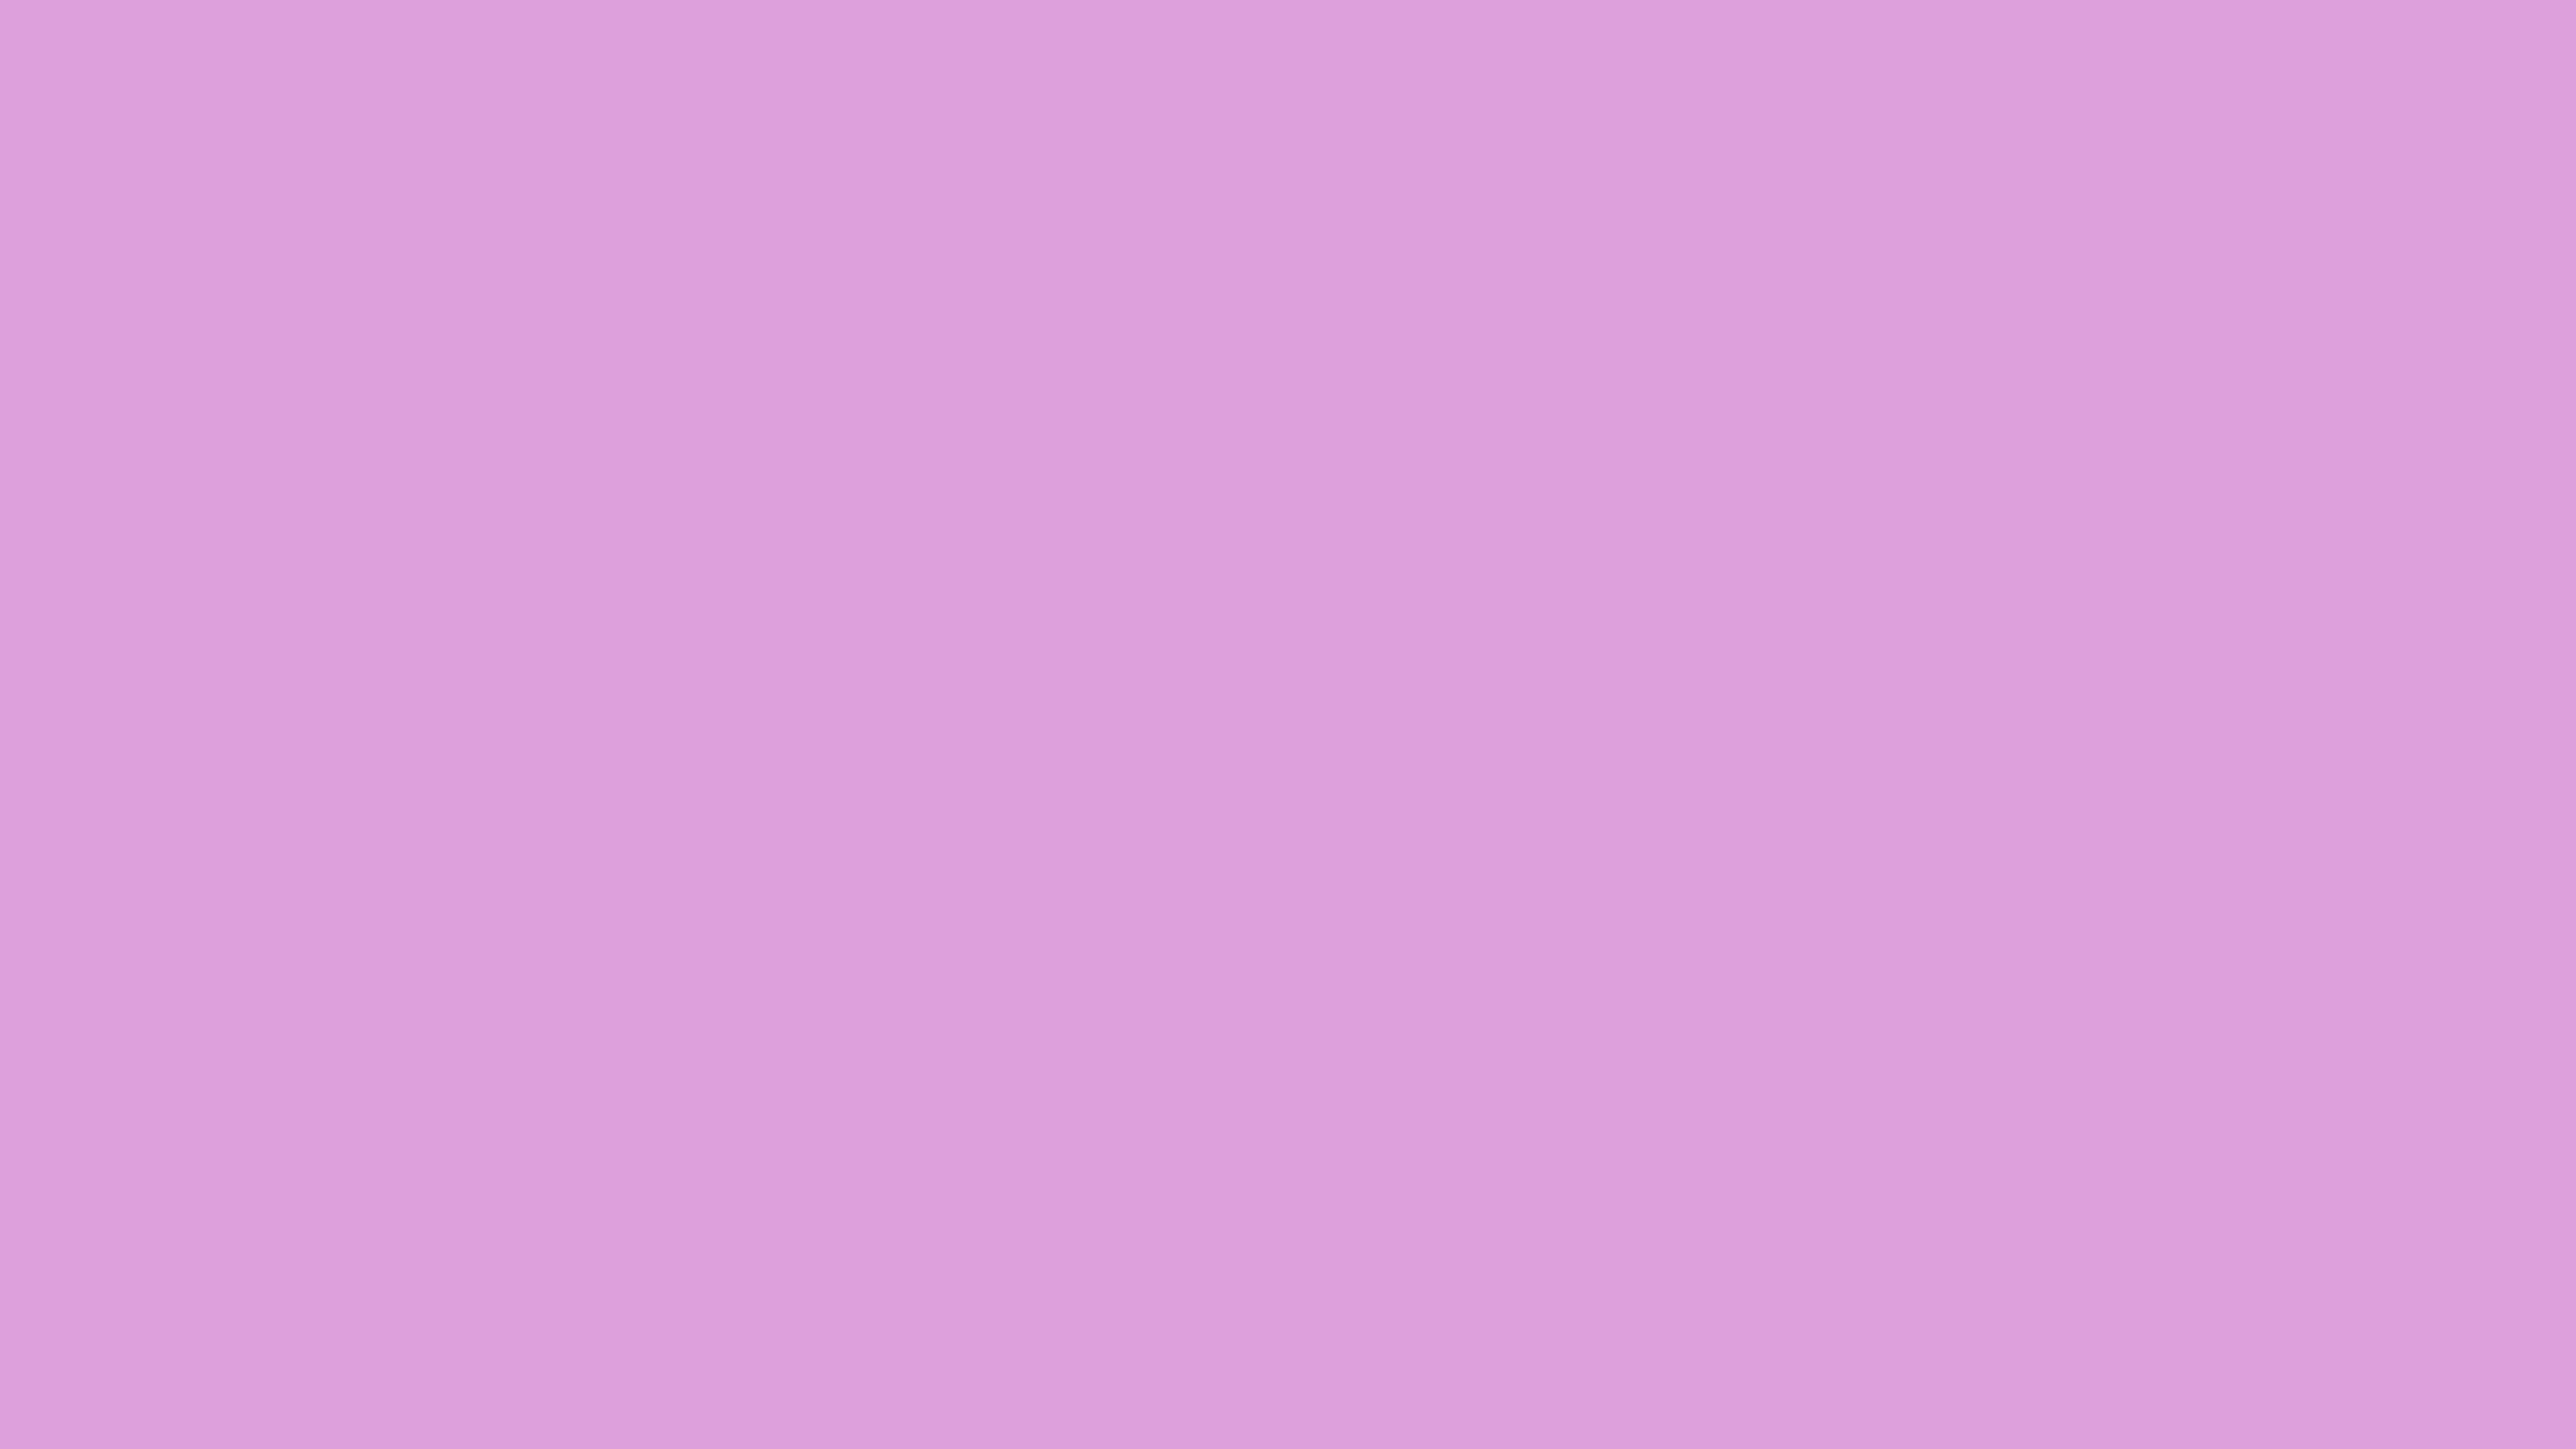 3840x2160 Plum Web Solid Color Background